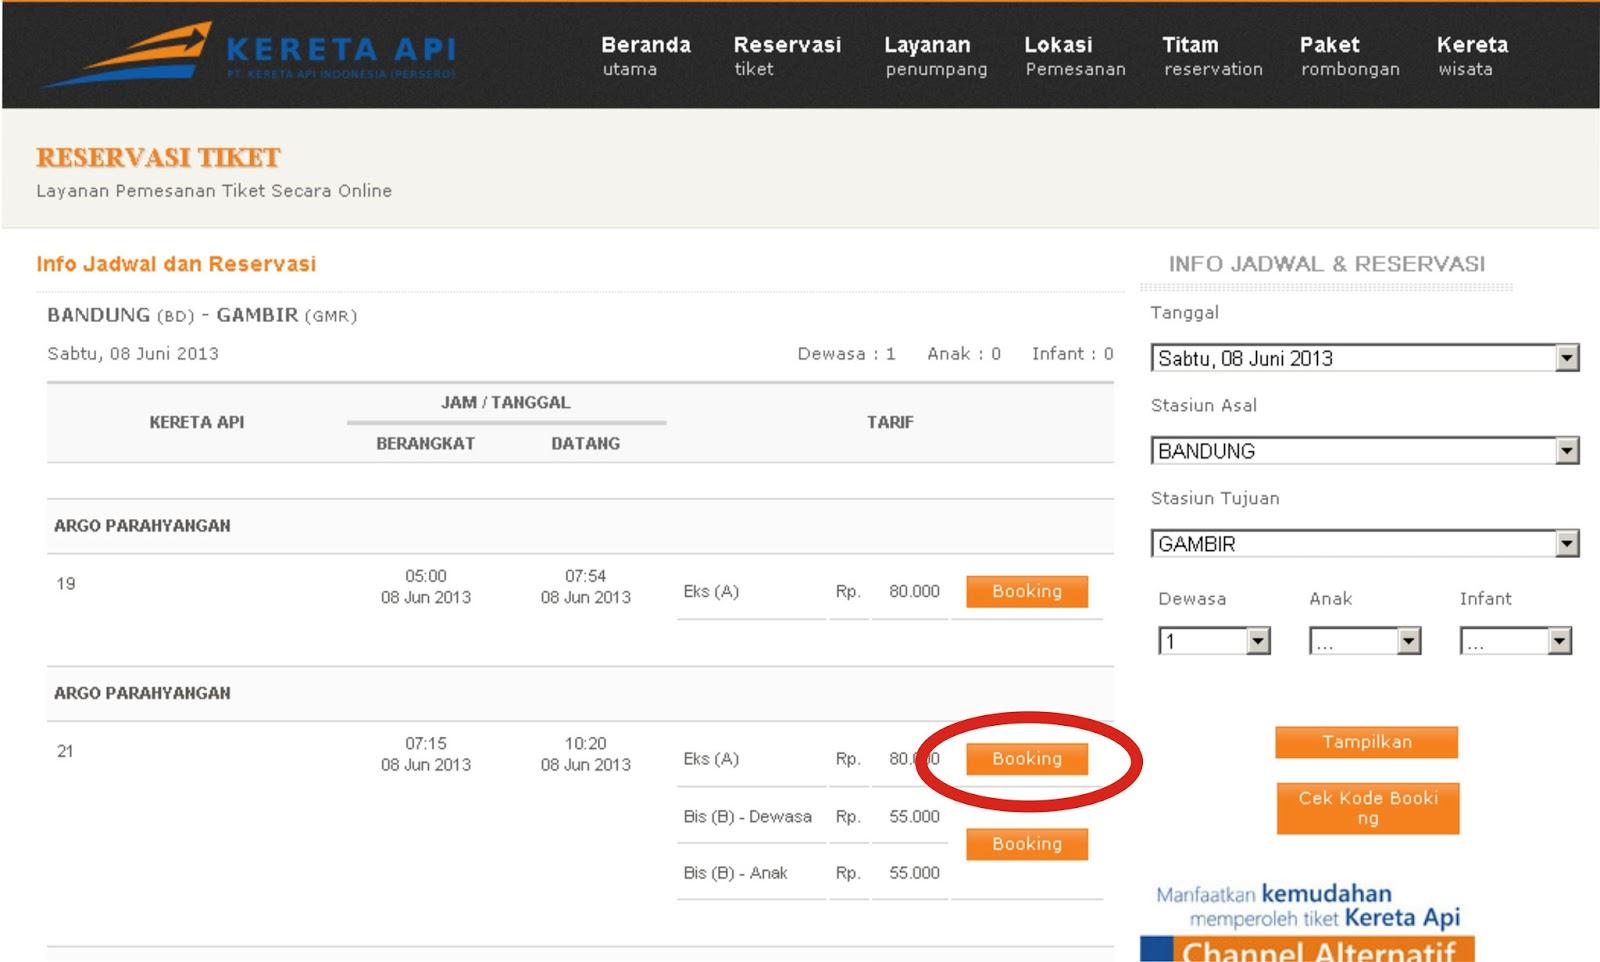 Cara pesan tiket kereta api online terbaru cara pesan tiket kereta cara pesan tiket kereta api online terbaru stopboris Gallery